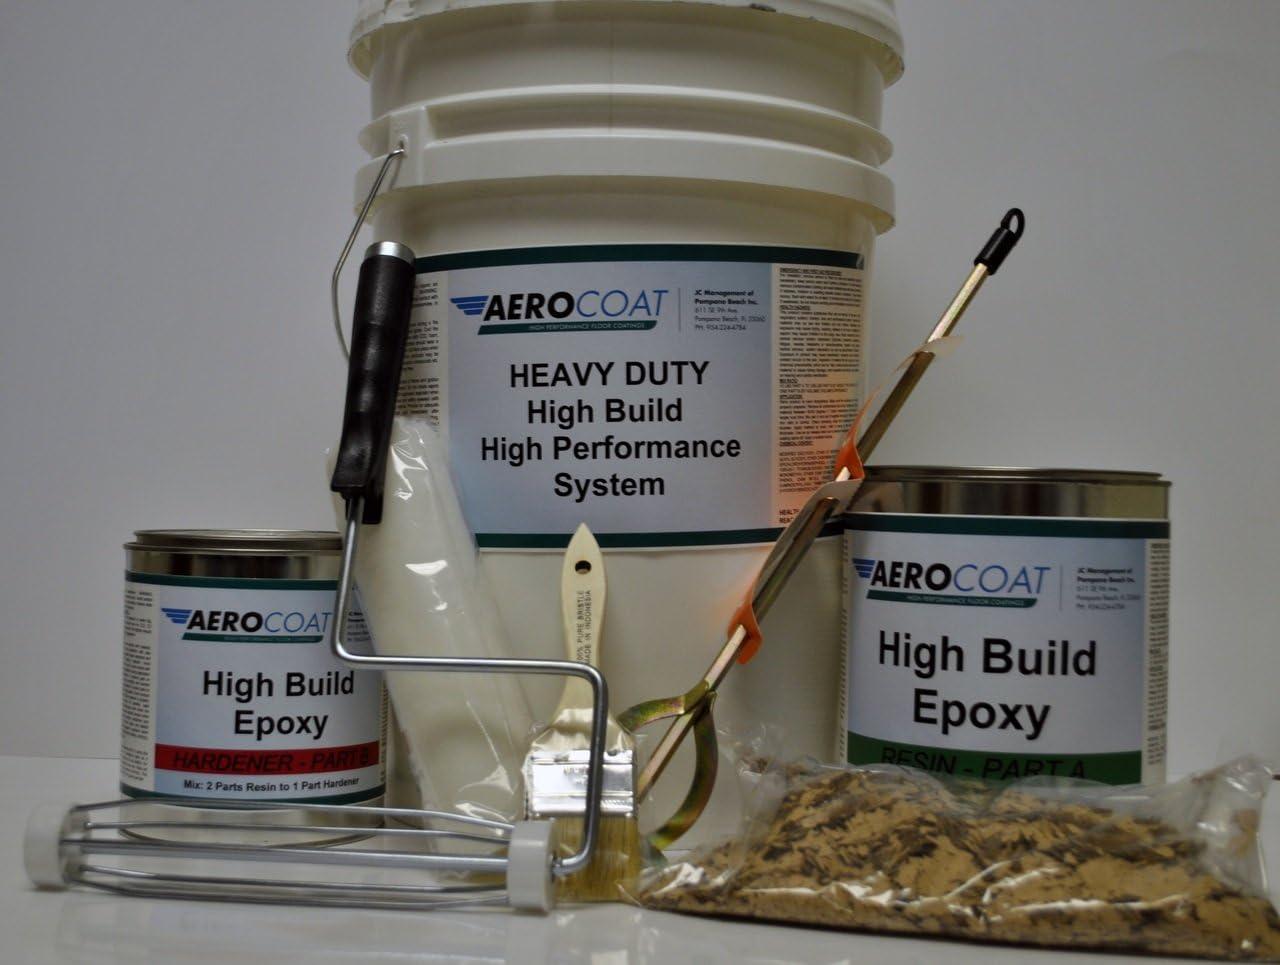 Aerocoat High Build Epoxy Tabletop Coating